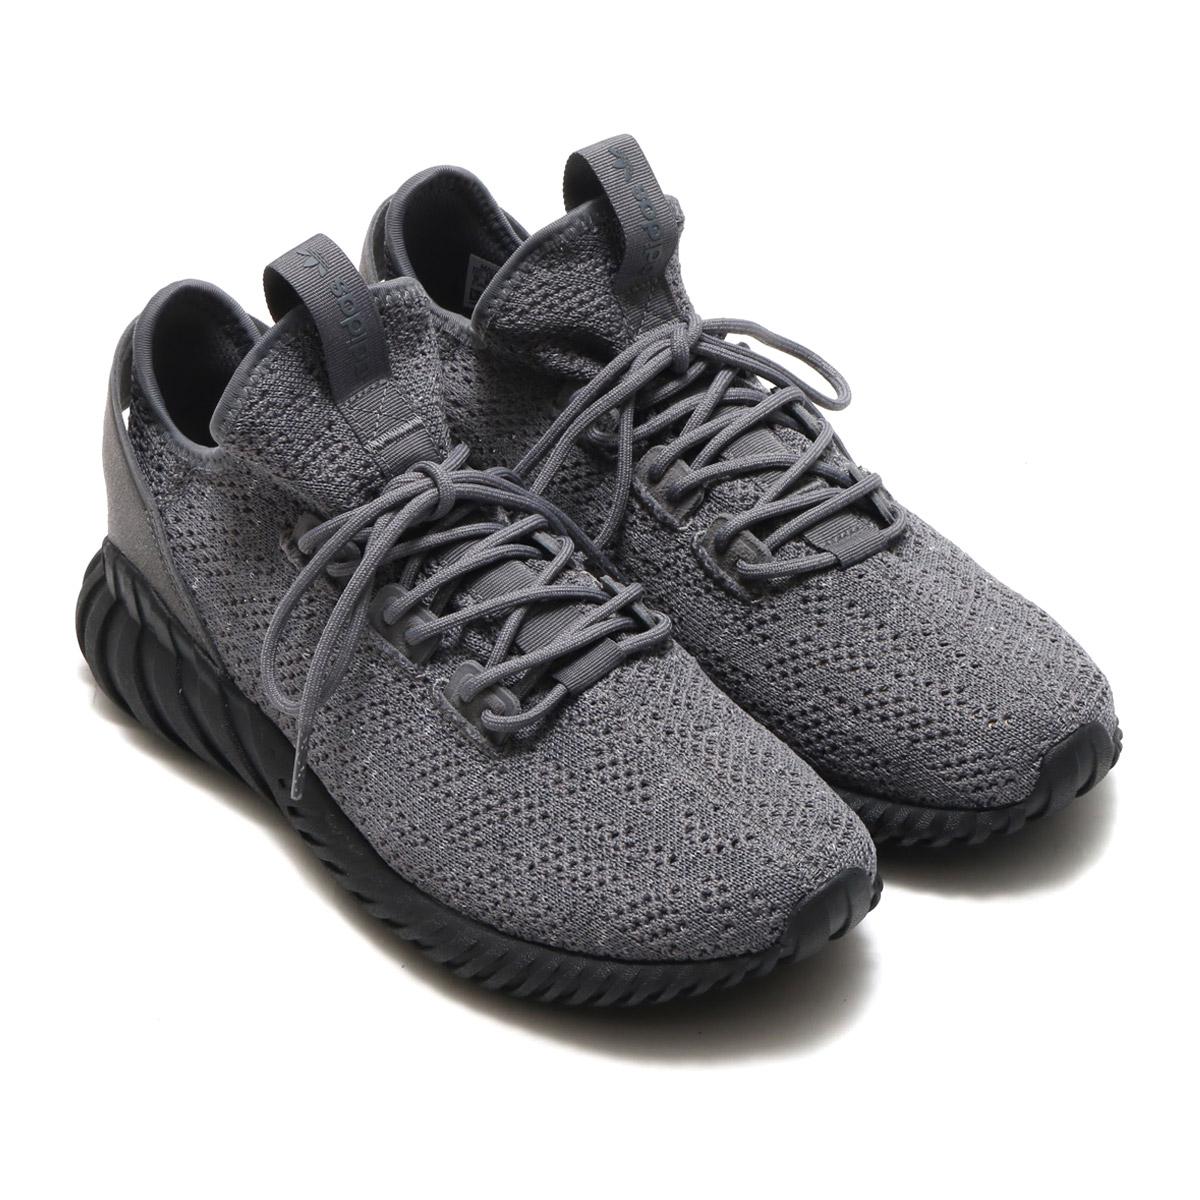 new arrival 28c3f 568fa adidas Originals TUBULAR DOOM SOCK PK (アディダスオリジナルスチューブラードゥームソック PK) Grey  Four/Core Black/Running White 17FW-I